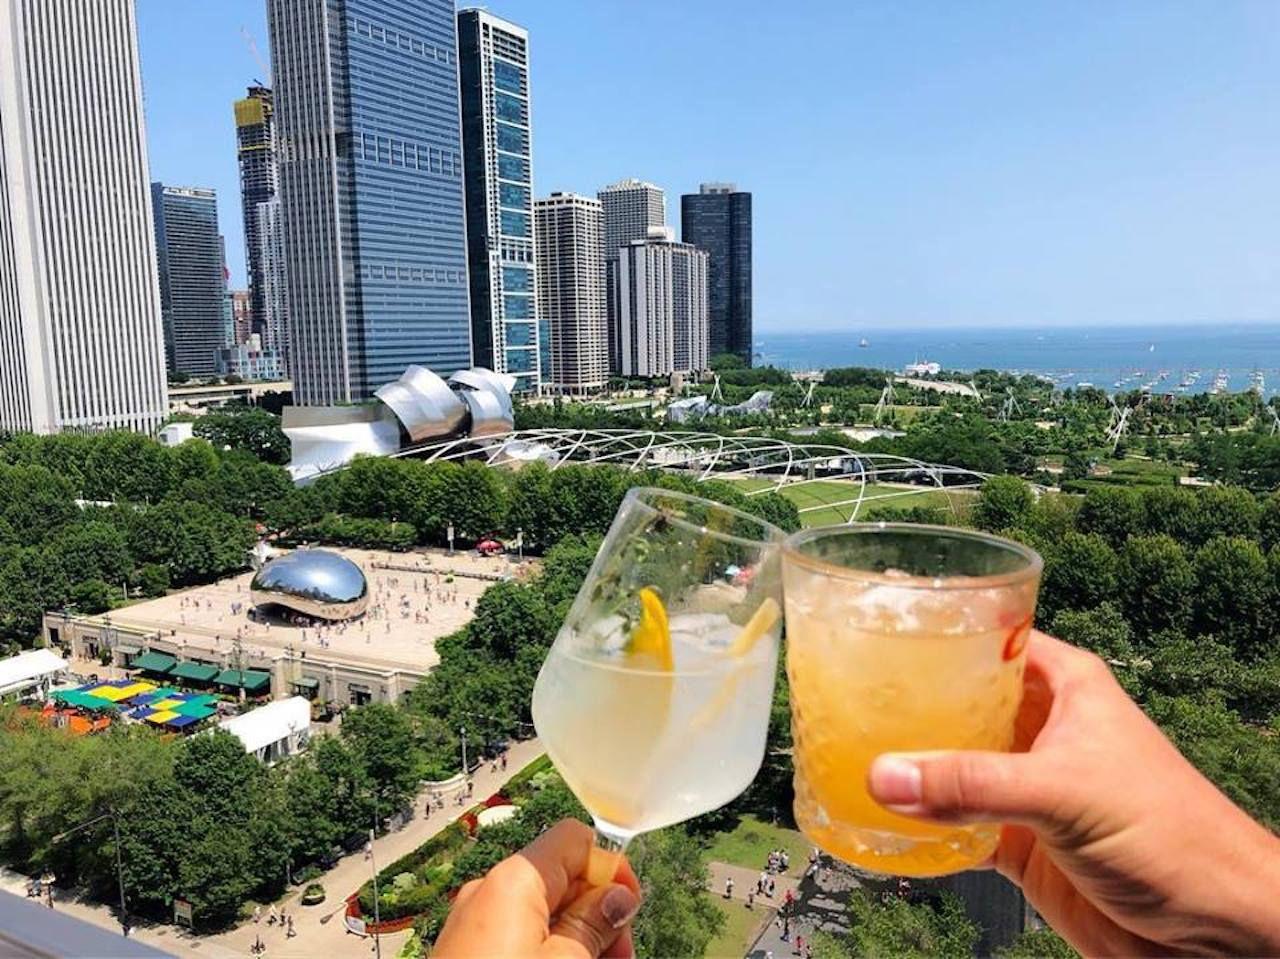 The 6 best outdoor bars in Chicago